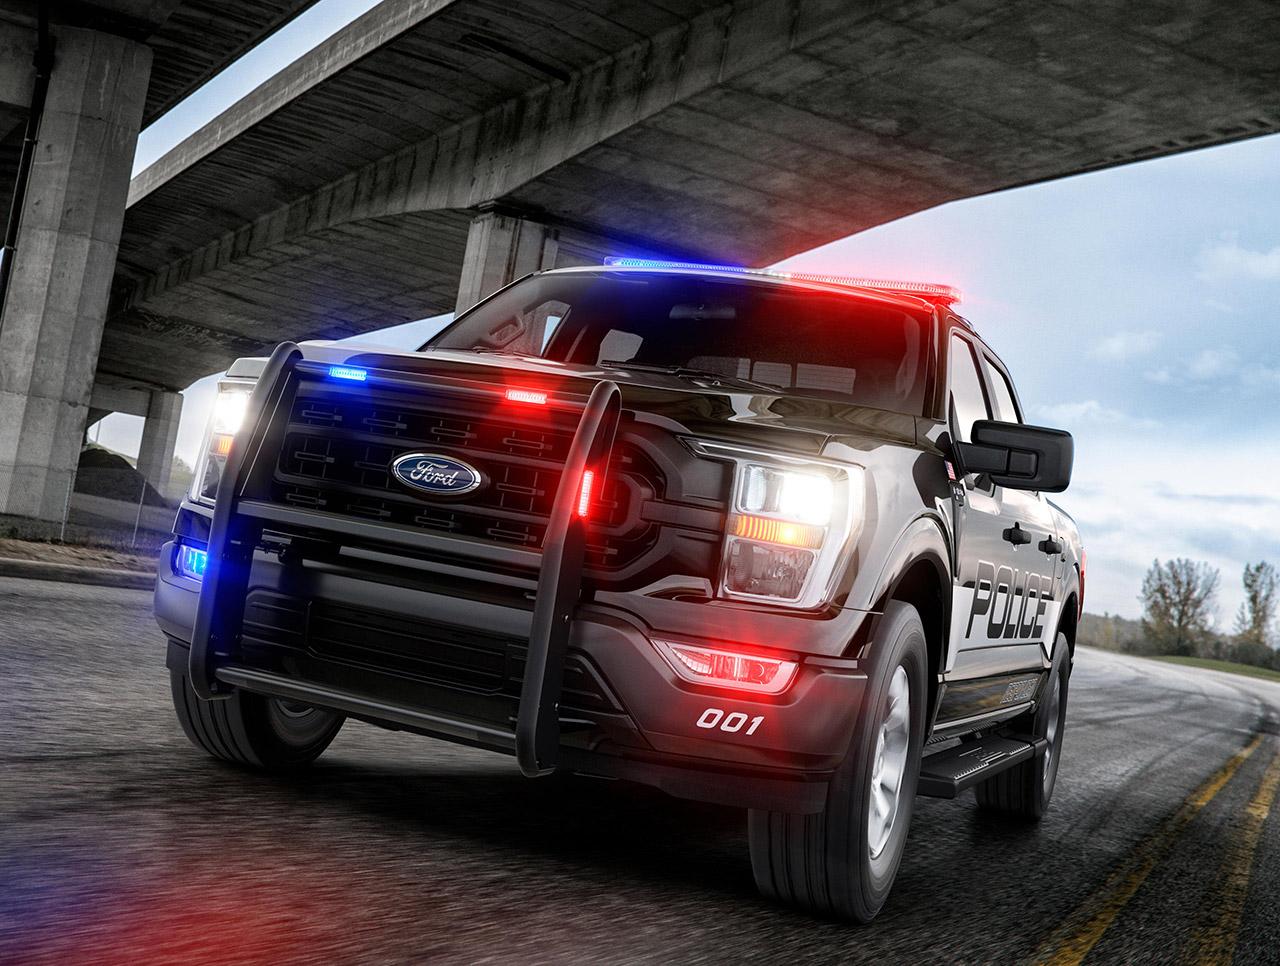 2021 Ford F-150 Police Responder Pickup Truck